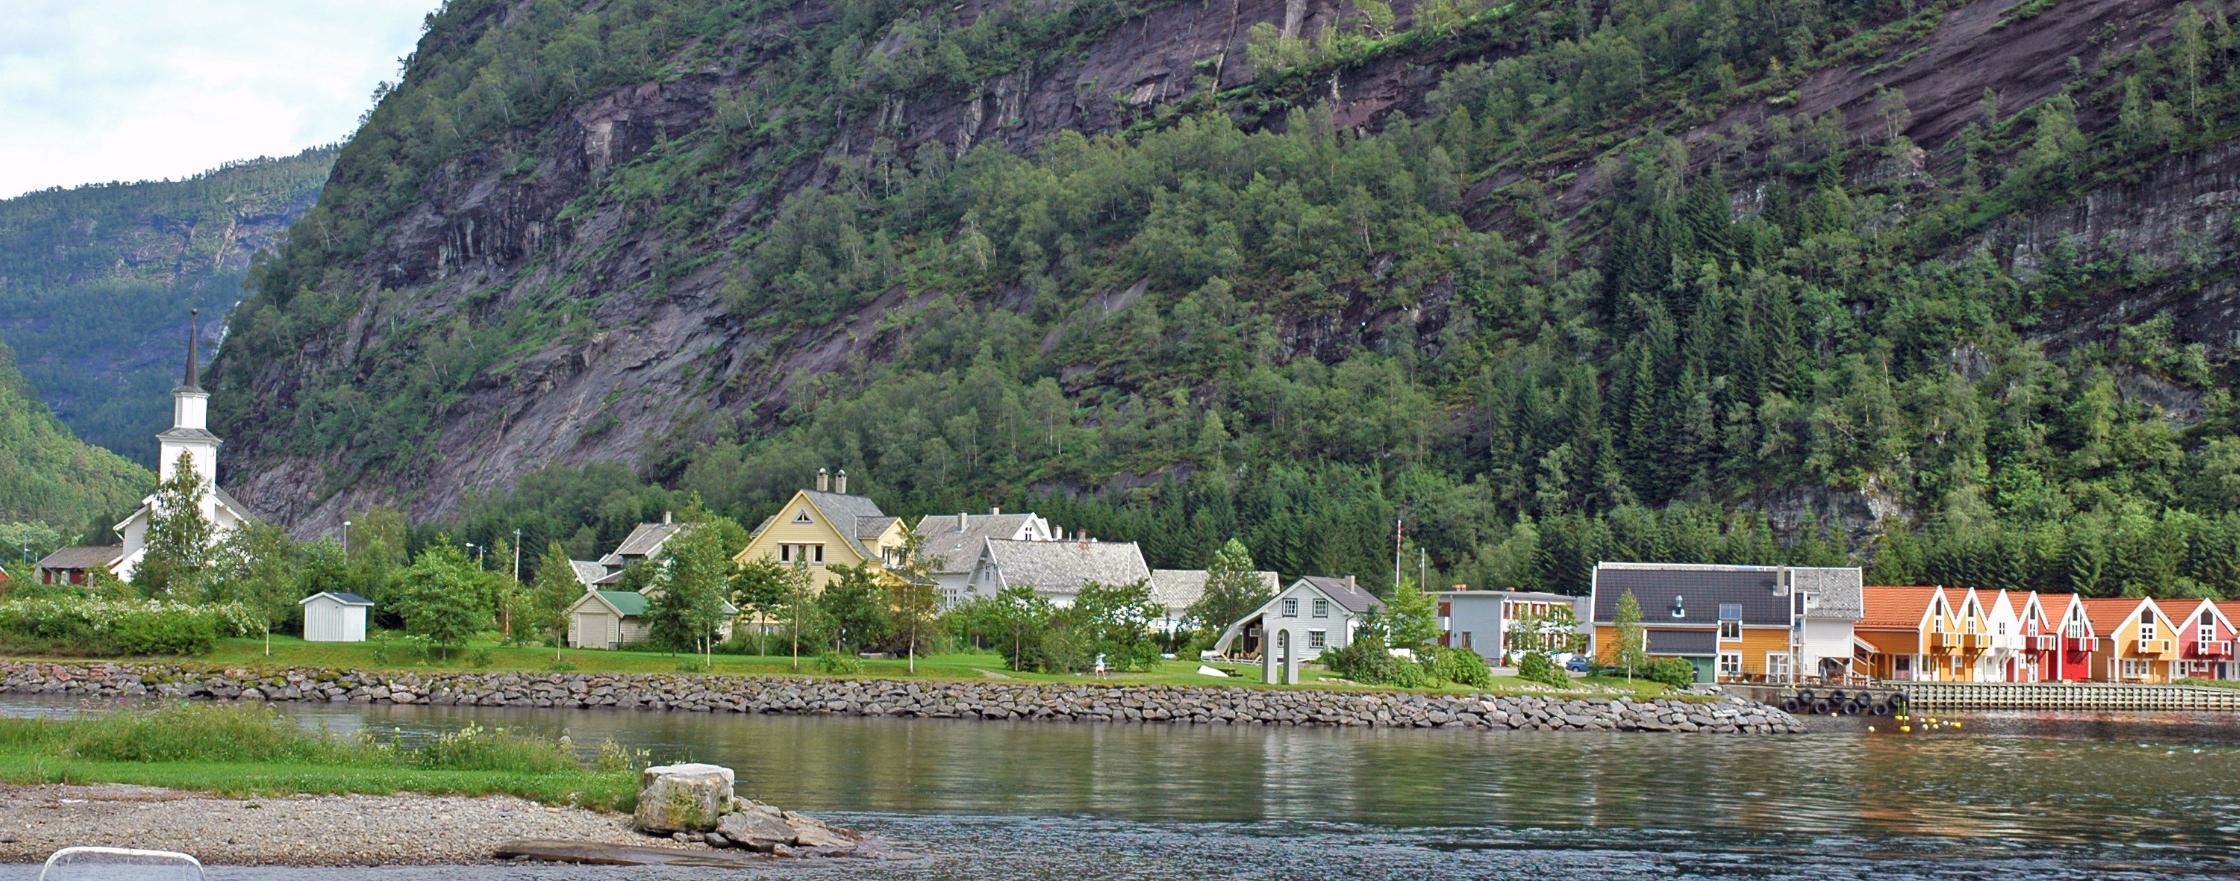 Norge Dating Modalen, Single Jenter Orsta